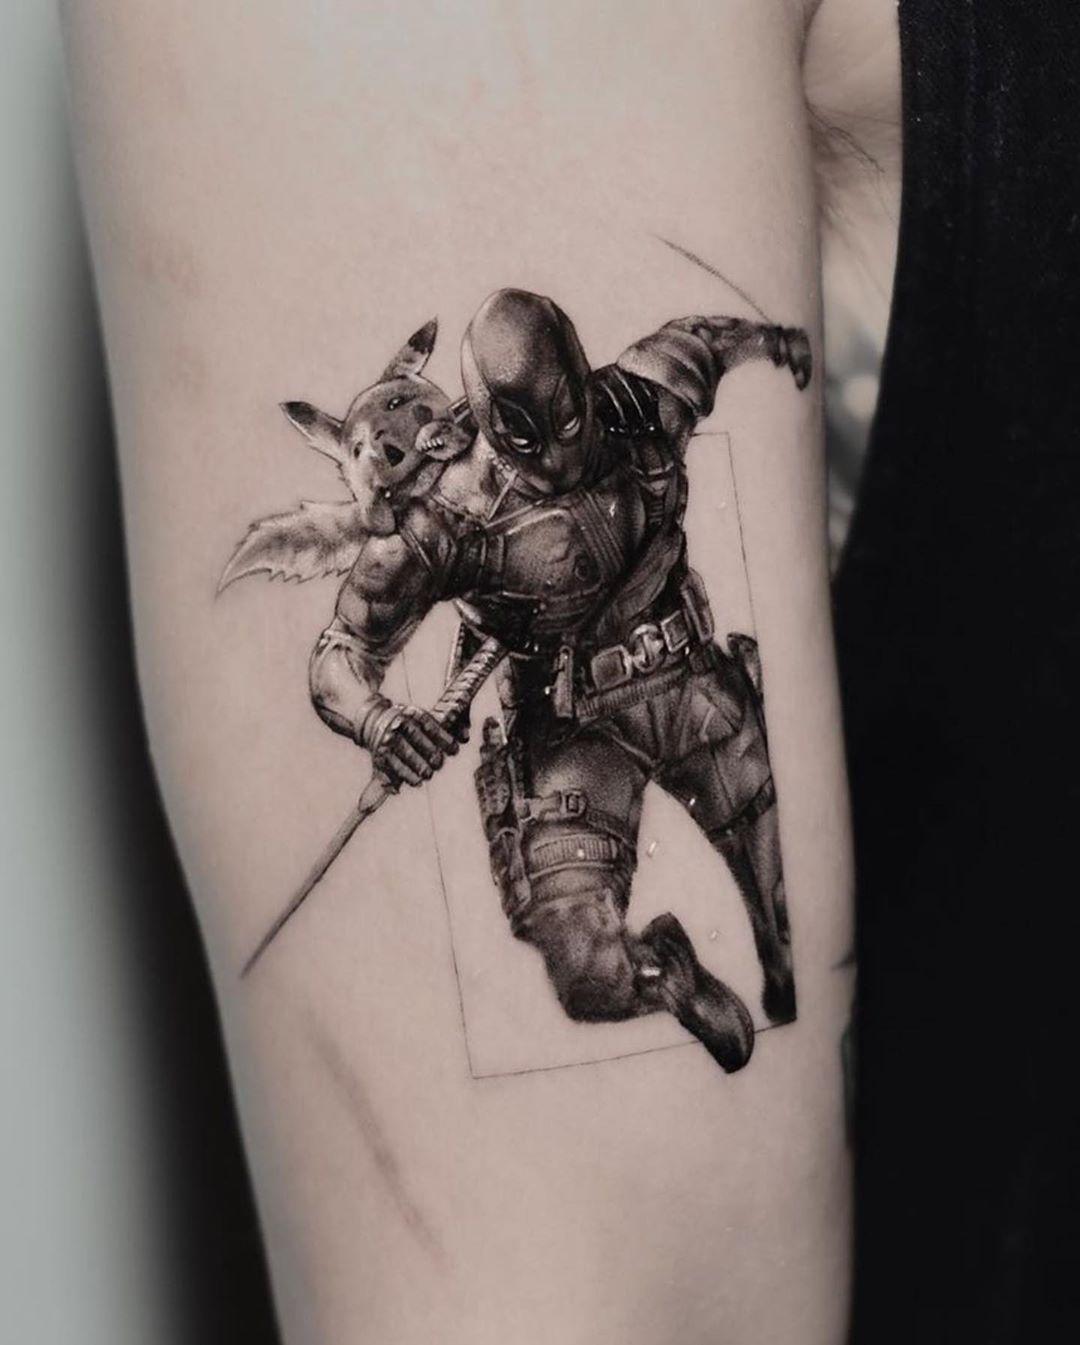 @ogitattooer  D E C E M B E R 2 0 1 9 . . . . . . #mommyimsorry #tattoo #tatoo ..., #* #amazingink #bng #bnginksociety #bodyart #contemporarytattooing #finelinetattoo #inkaddict #inked #inkedlife #inkedtattoo #inkjunkeyz #inklove #mommyimsorry #newyorktattoo #realistictattoo #stuttgarttattoo #tatoo #tatt #tattoo #tattooaddict #tattooart #tattooidea #tattooideas #tattooink #tattooinspiration #tattoolifestyle #tattoolove #tattoolover #tattoooftheday #tatuaje